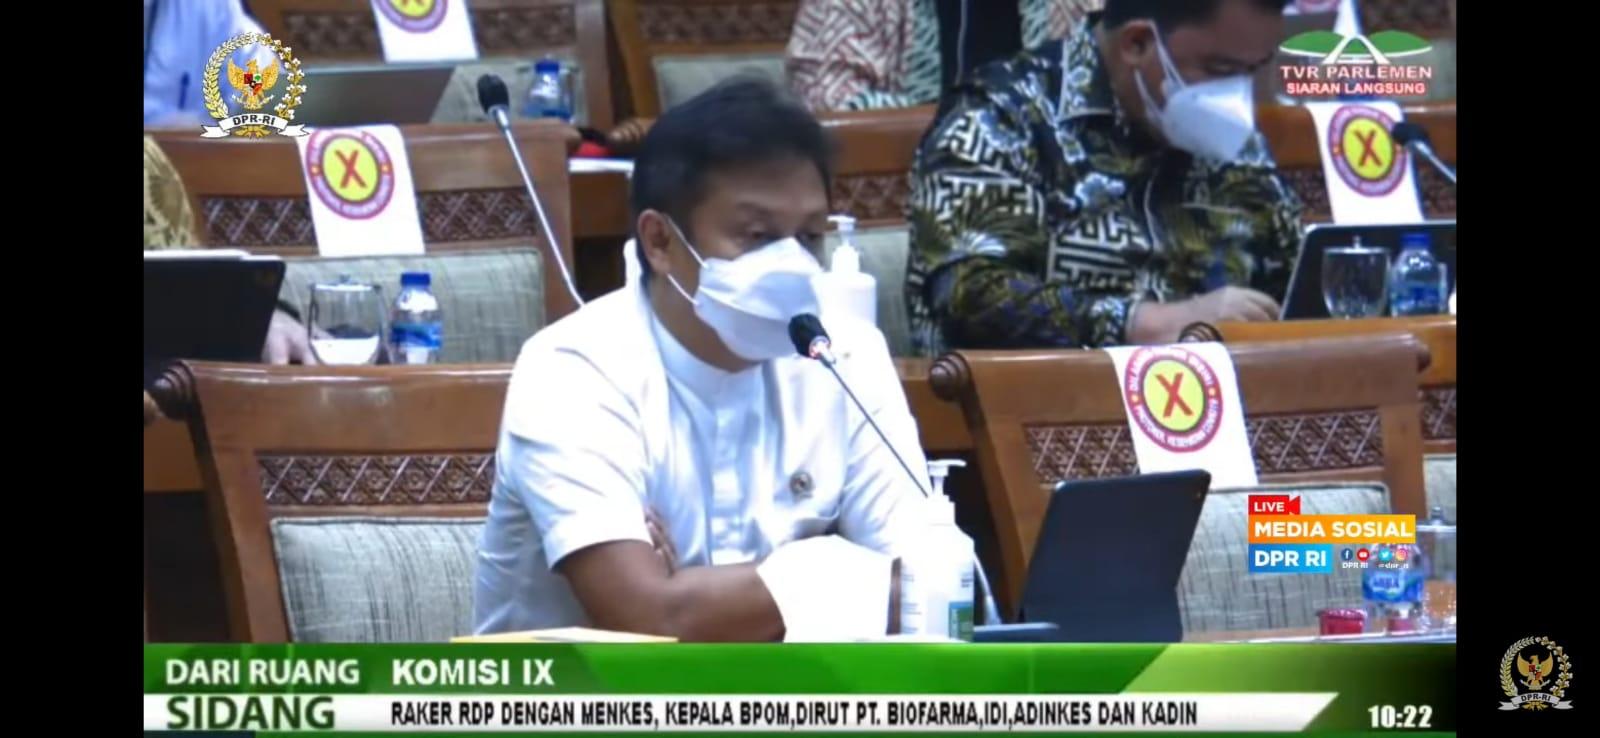 Menkes, Budi Gunadi Sadikin, dalam Rapat Kerja bersama Komisi IX DPR RI, Rabu (25/8/2021). FOTO: Tangkap layar Youtube DPR/Lingkar.co